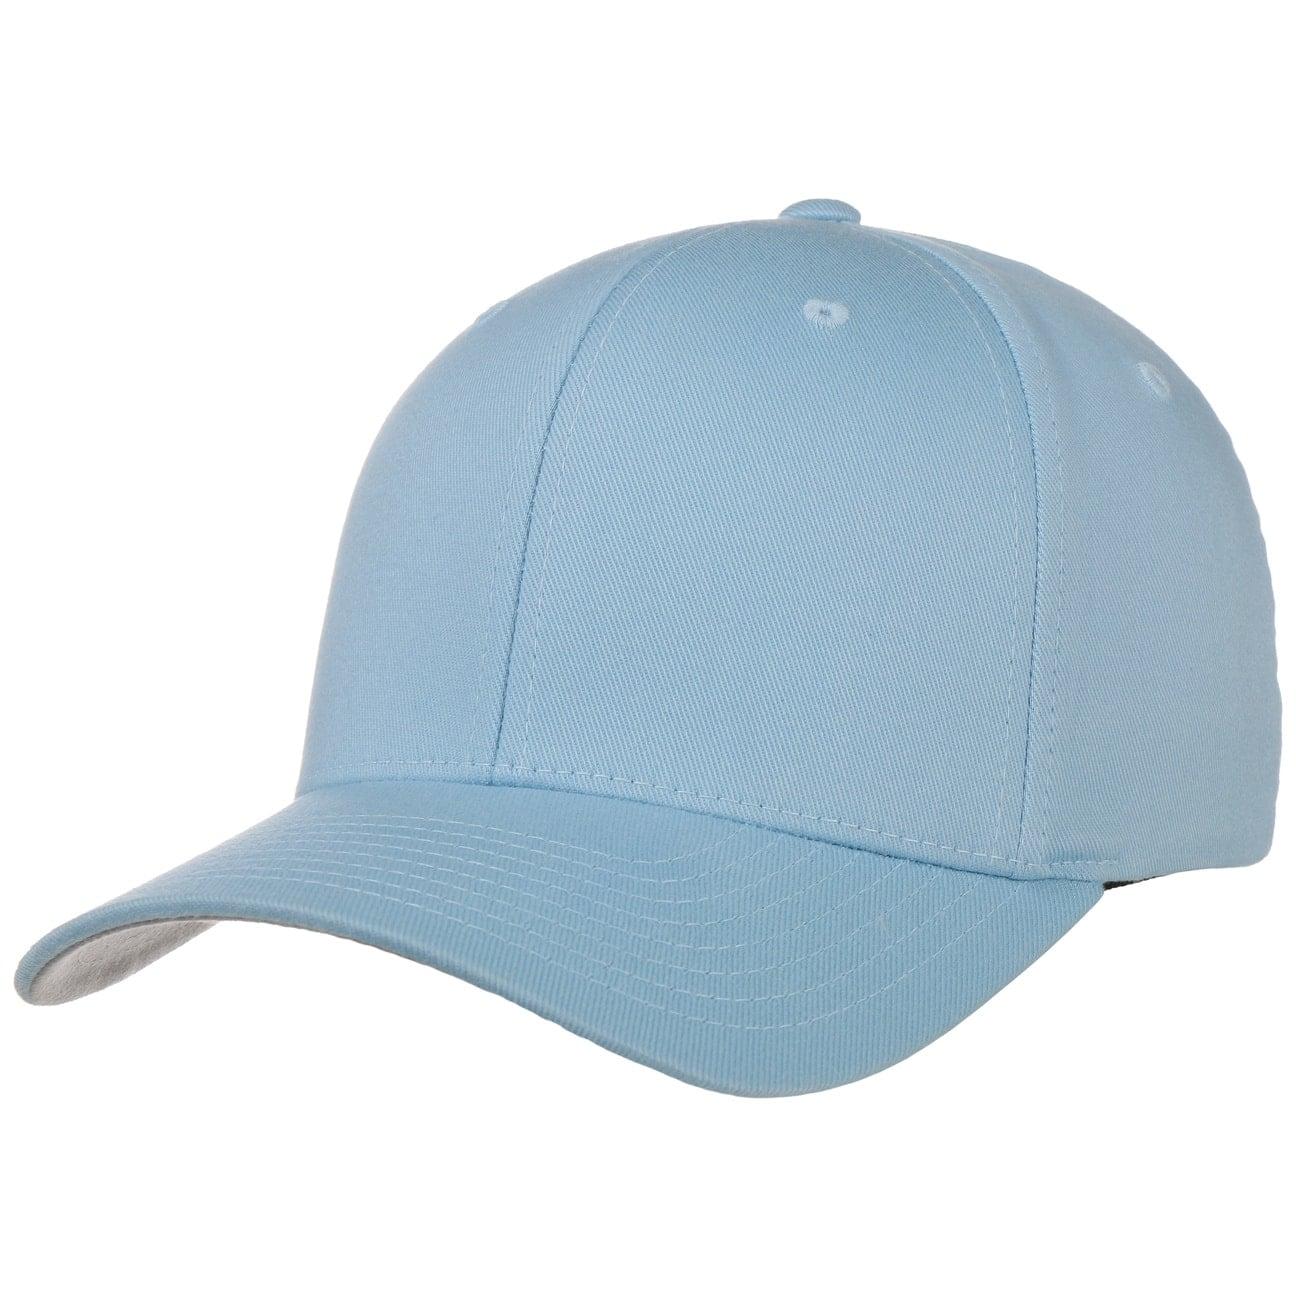 Gorra Flexfit Spandex - Gorras - sombreroshop.es ec7fafa6982